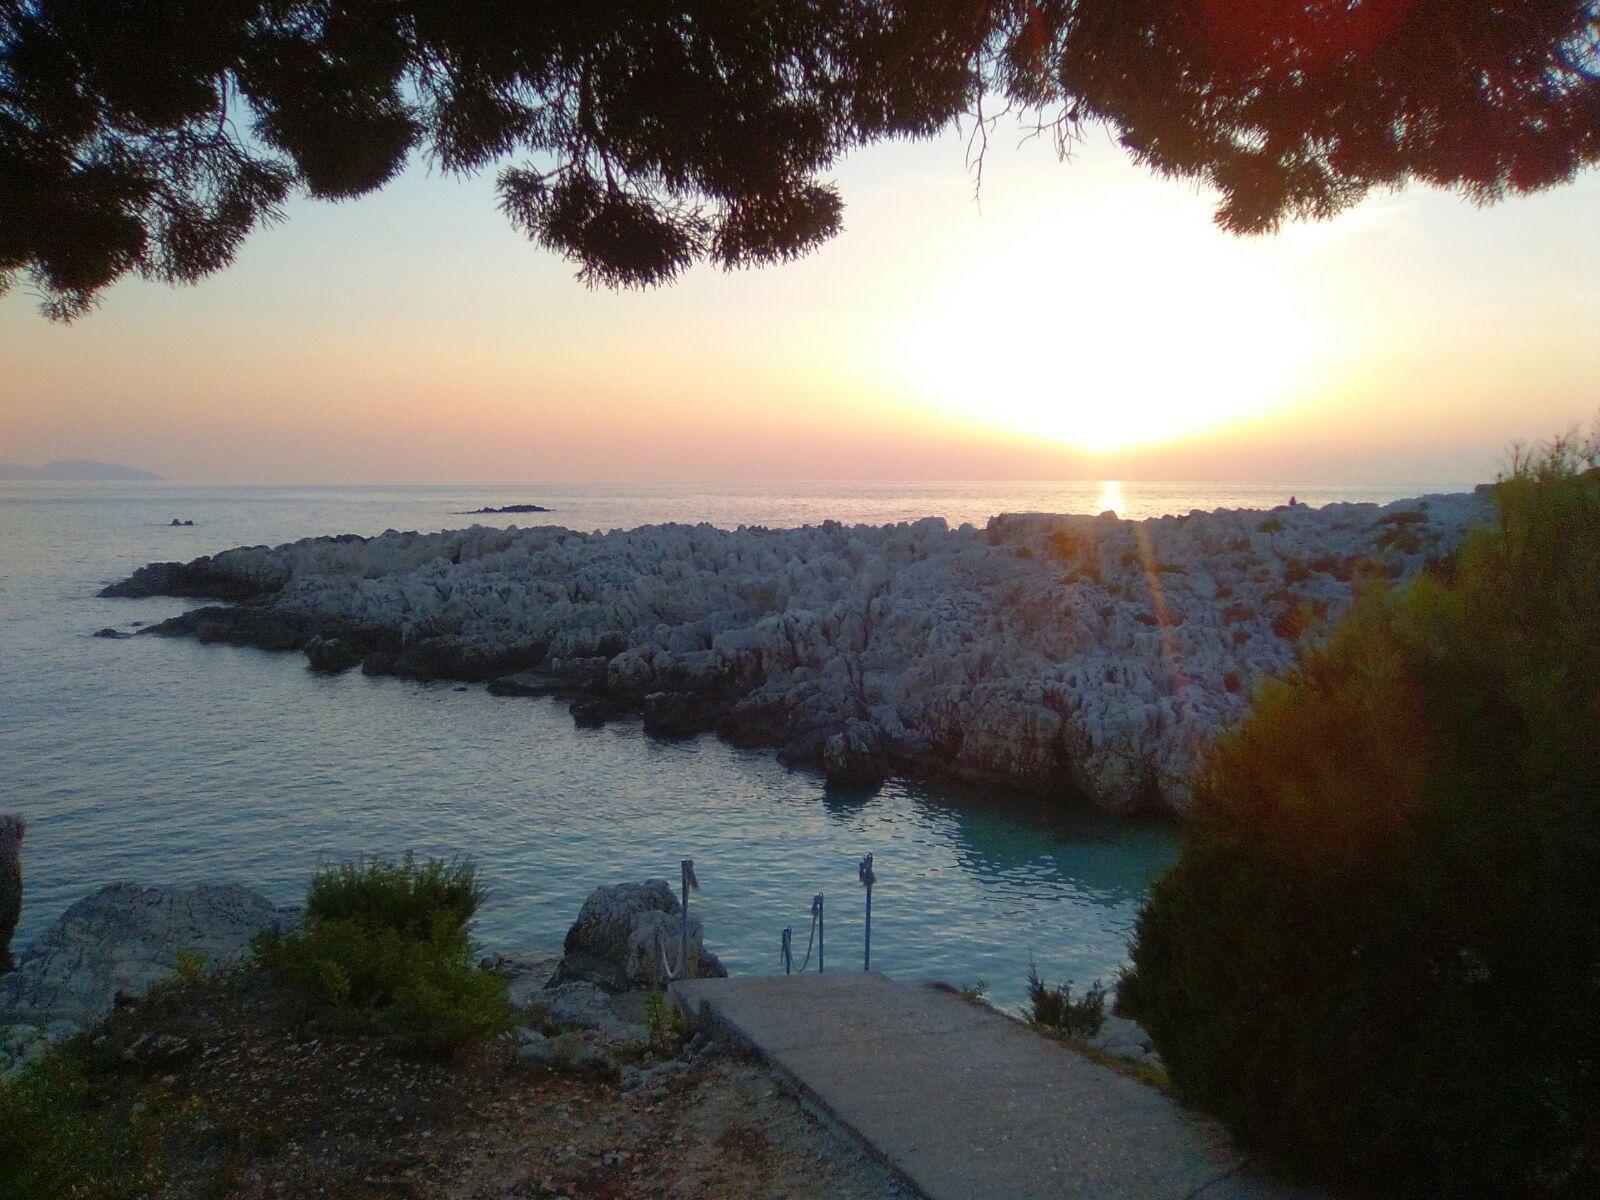 Sunset  by Simona Salvuccelli Ranchi